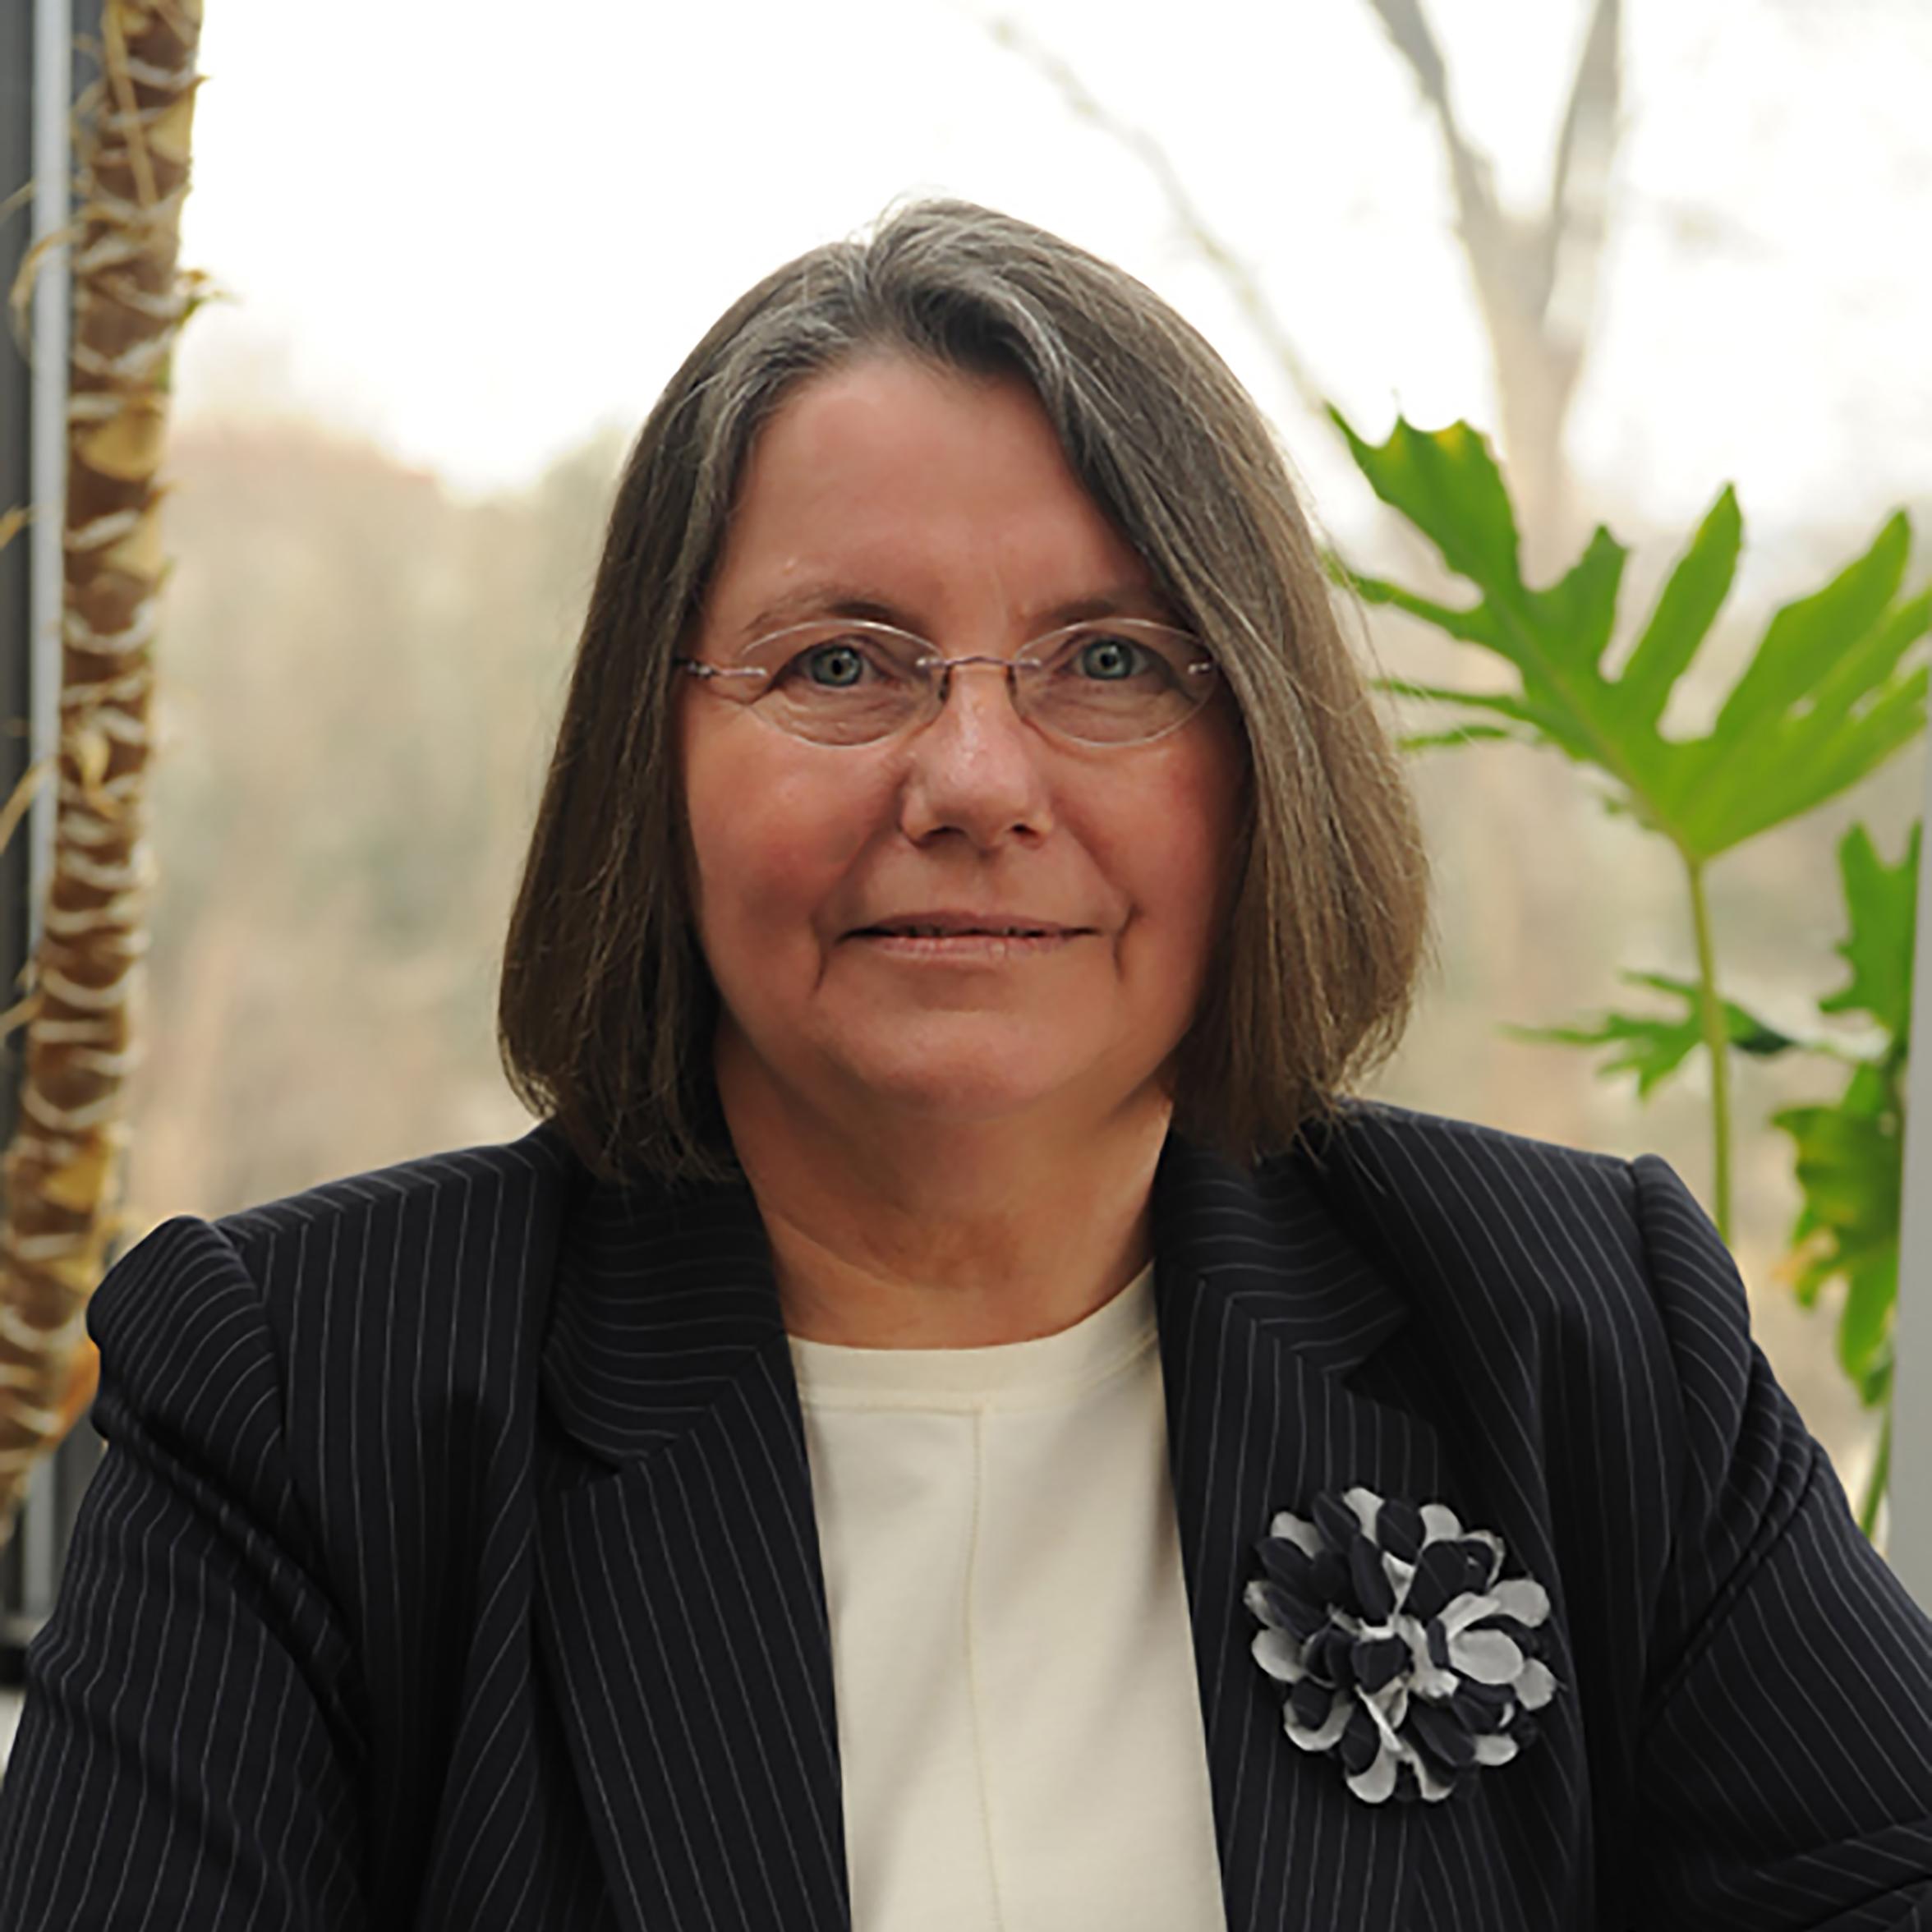 Patricia Crosby